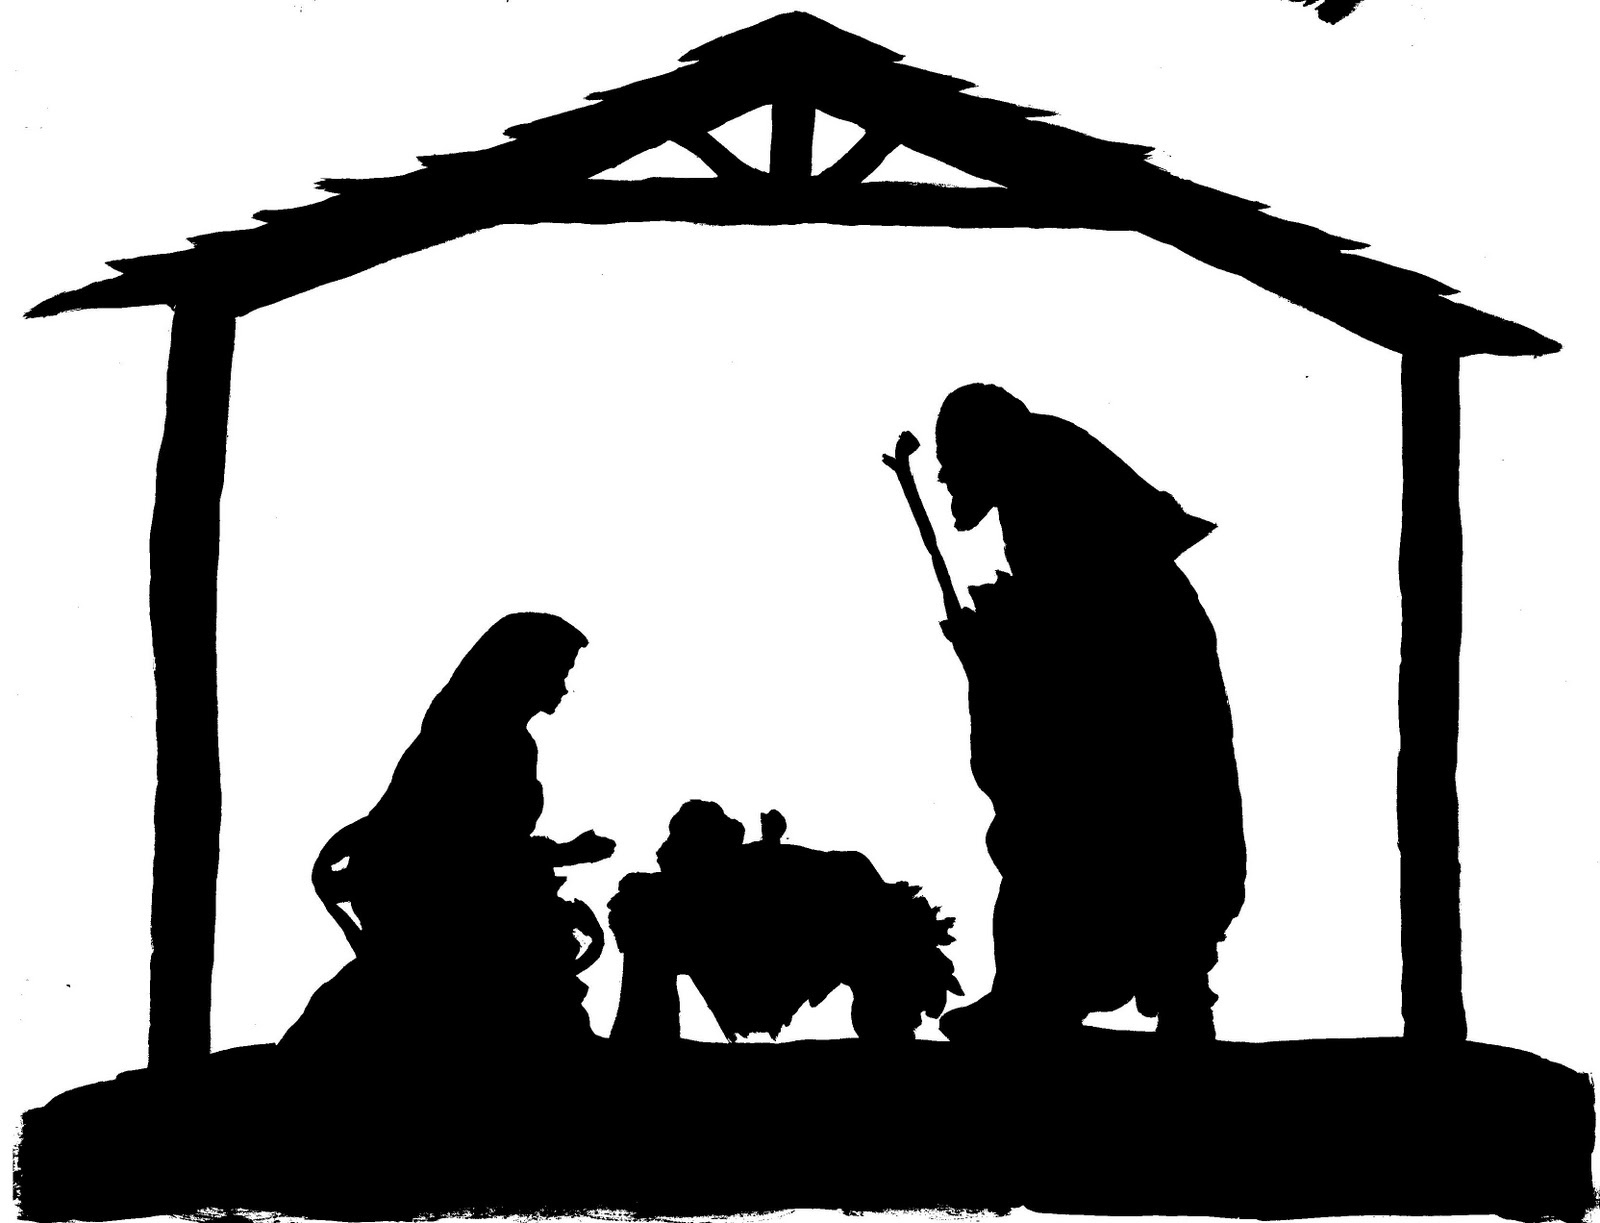 Free Nativity Scene Pictures, Download Free Clip Art, Free Clip Art - Free Printable Pictures Of Nativity Scenes